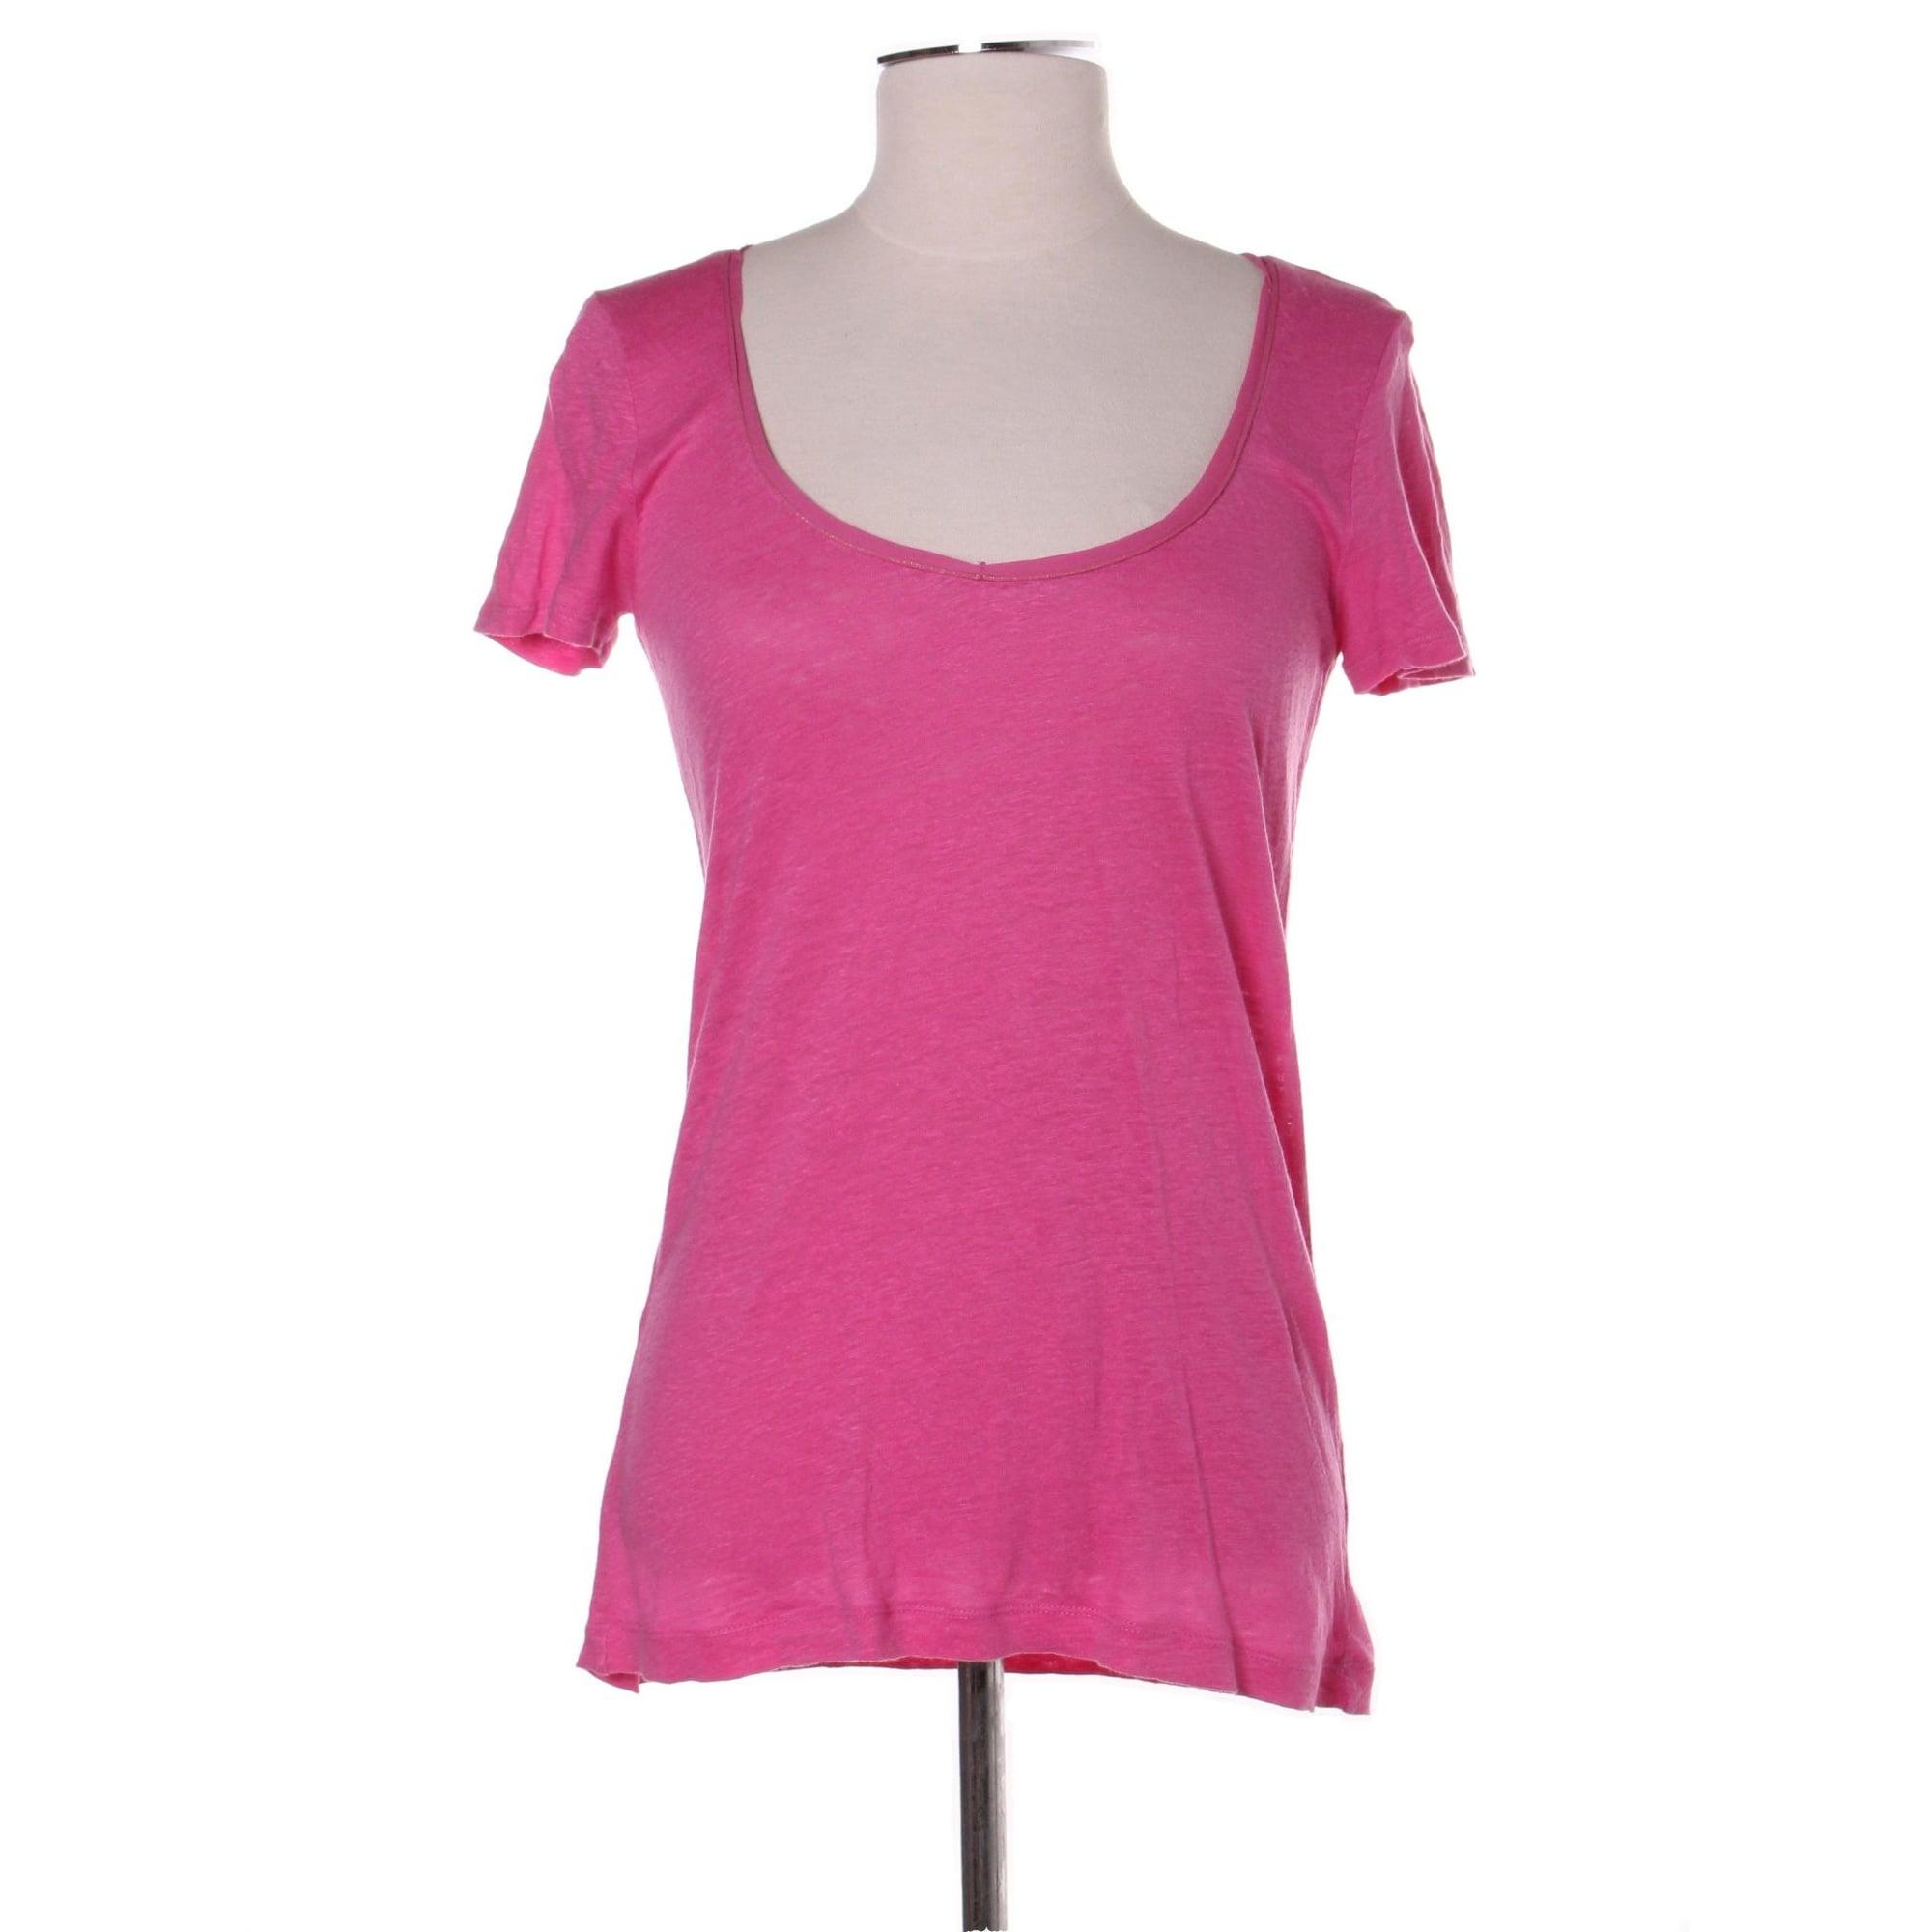 Top, tee-shirt COMPTOIR DES COTONNIERS Rose, fuschia, vieux rose